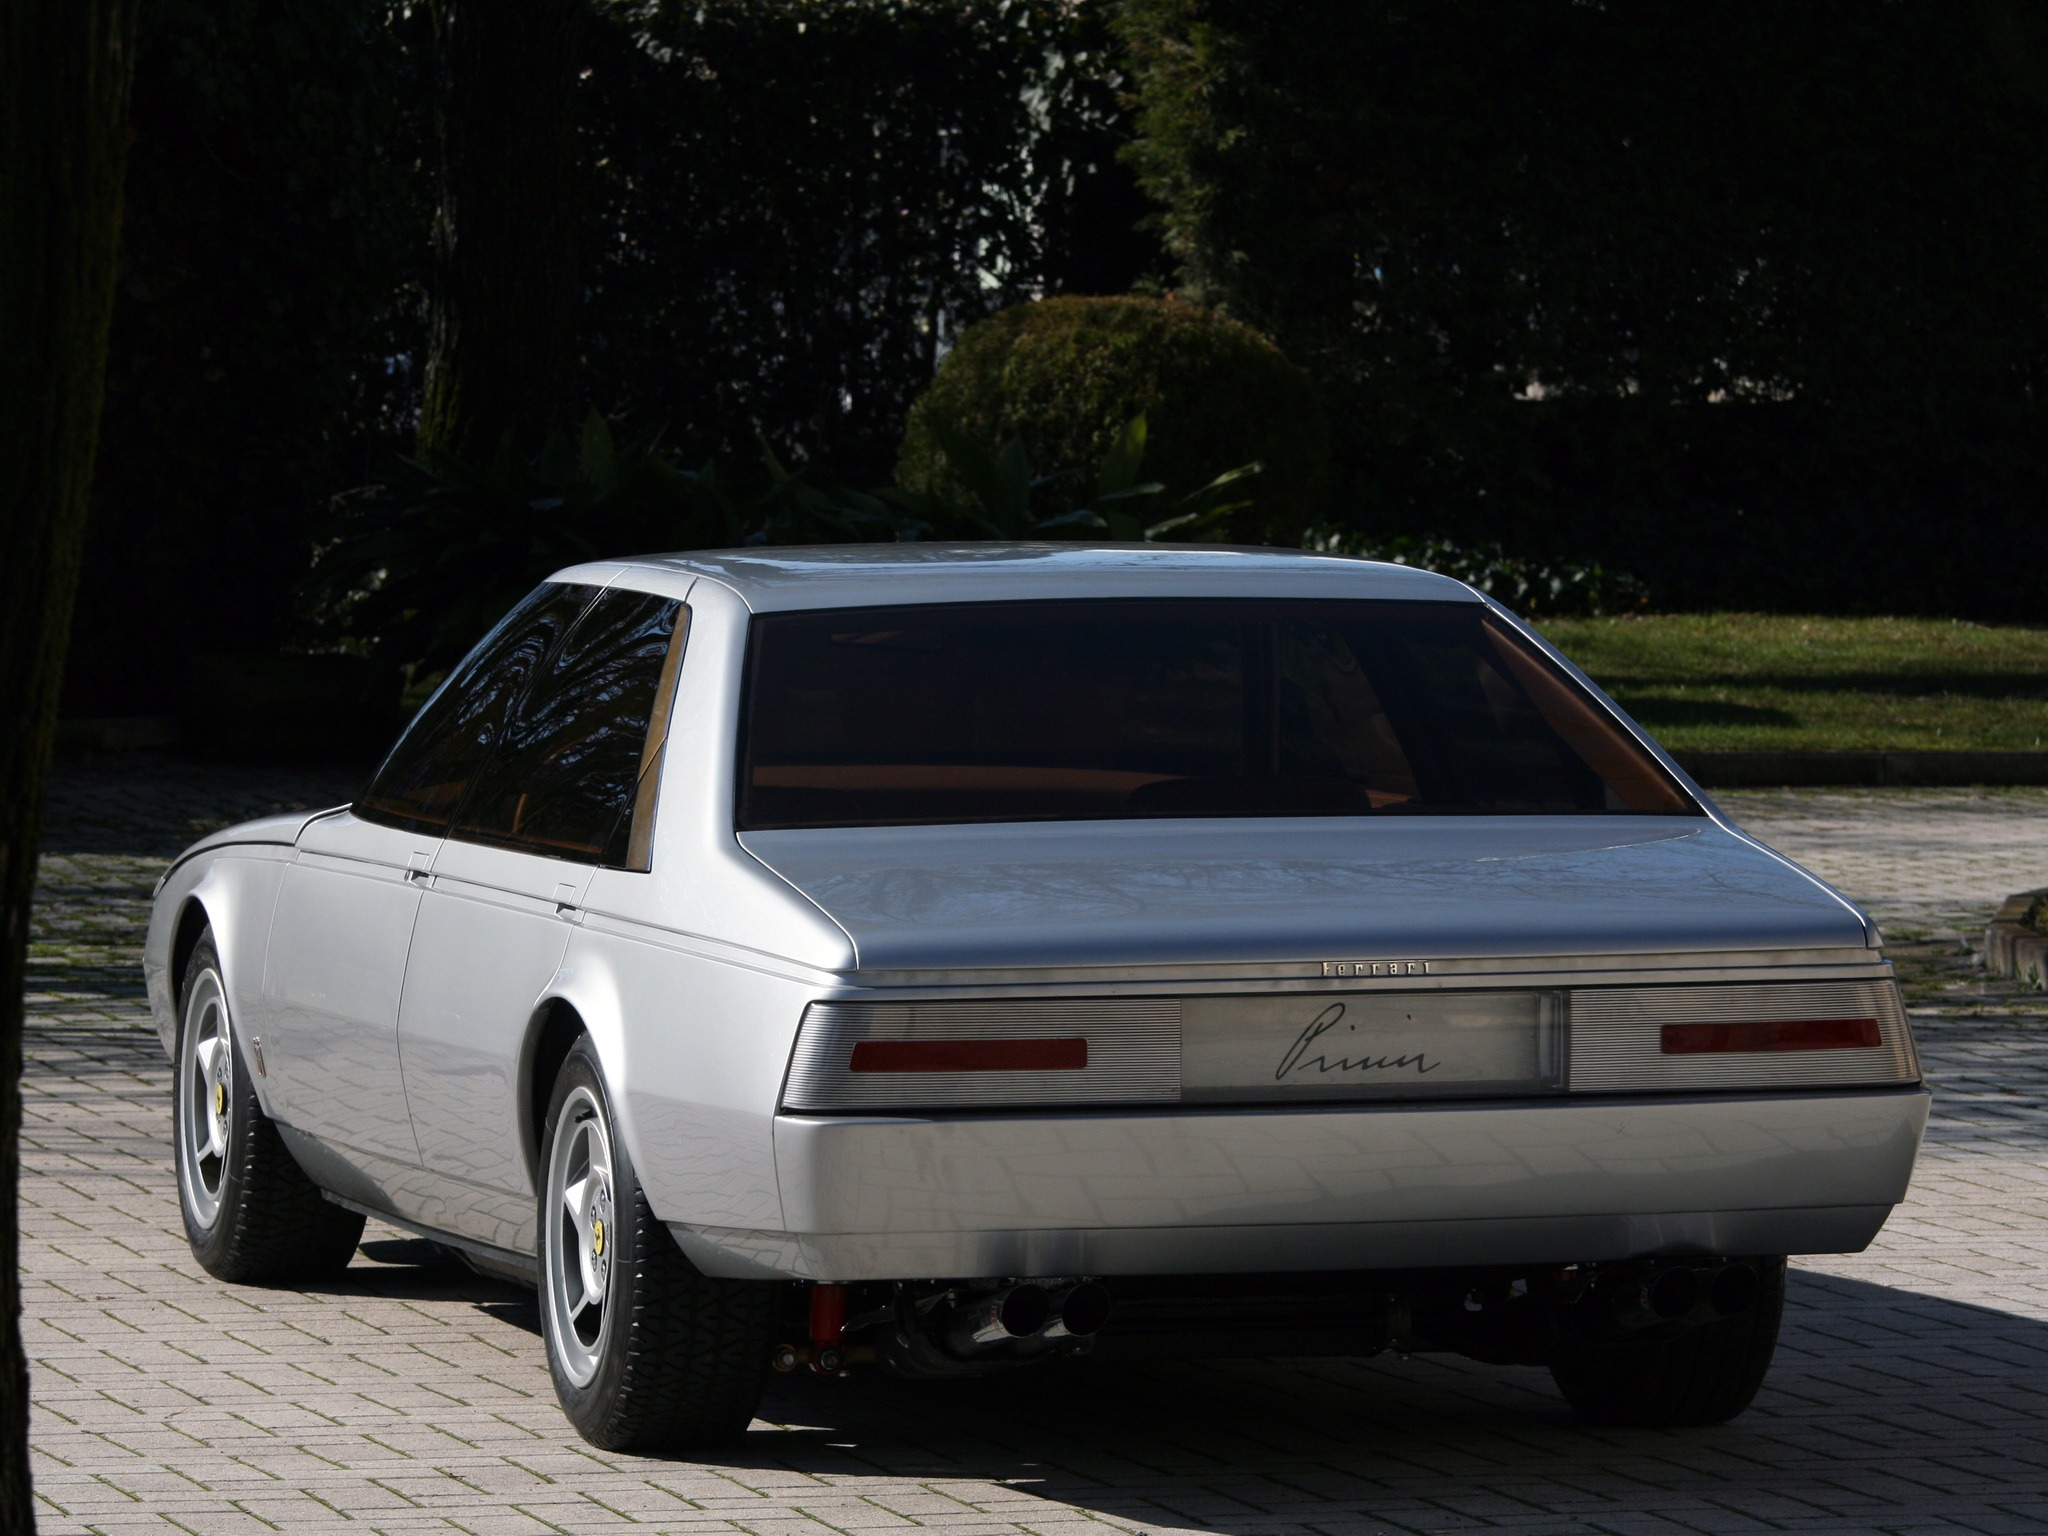 Top Fastest Cars >> Ferrari Pinin (1980) - Old Concept Cars